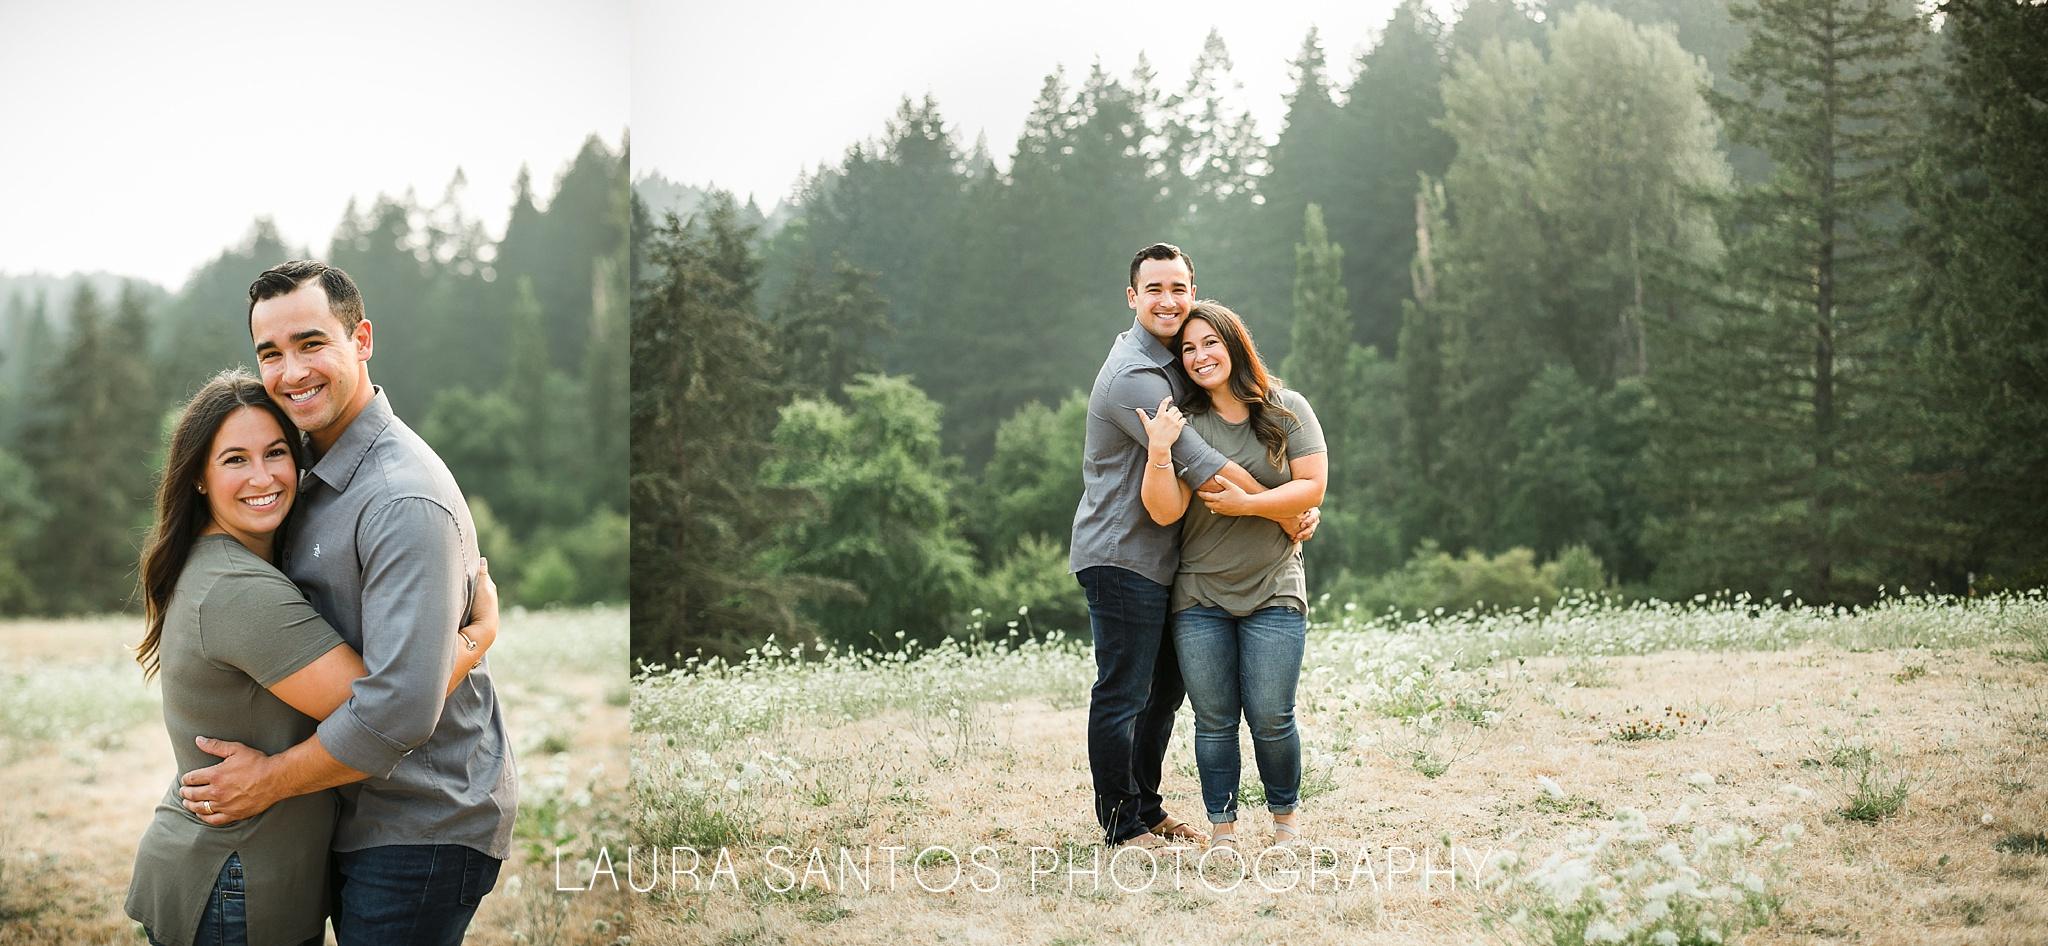 Laura Santos Photography Portland Oregon Family Photographer_0155.jpg